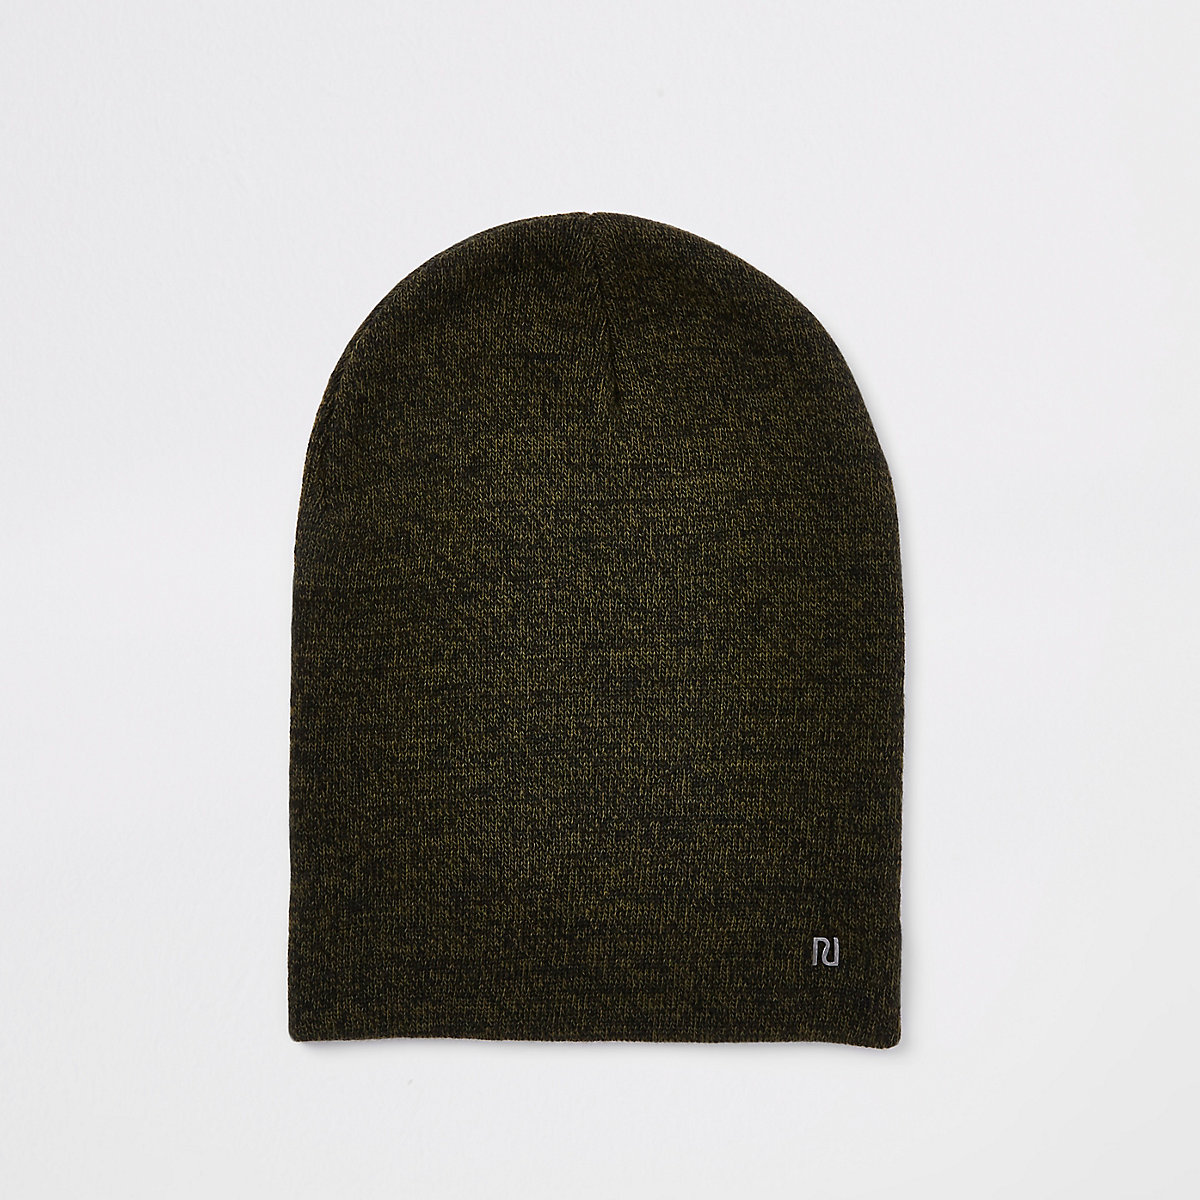 Khaki green twist knit slouch beanie hat